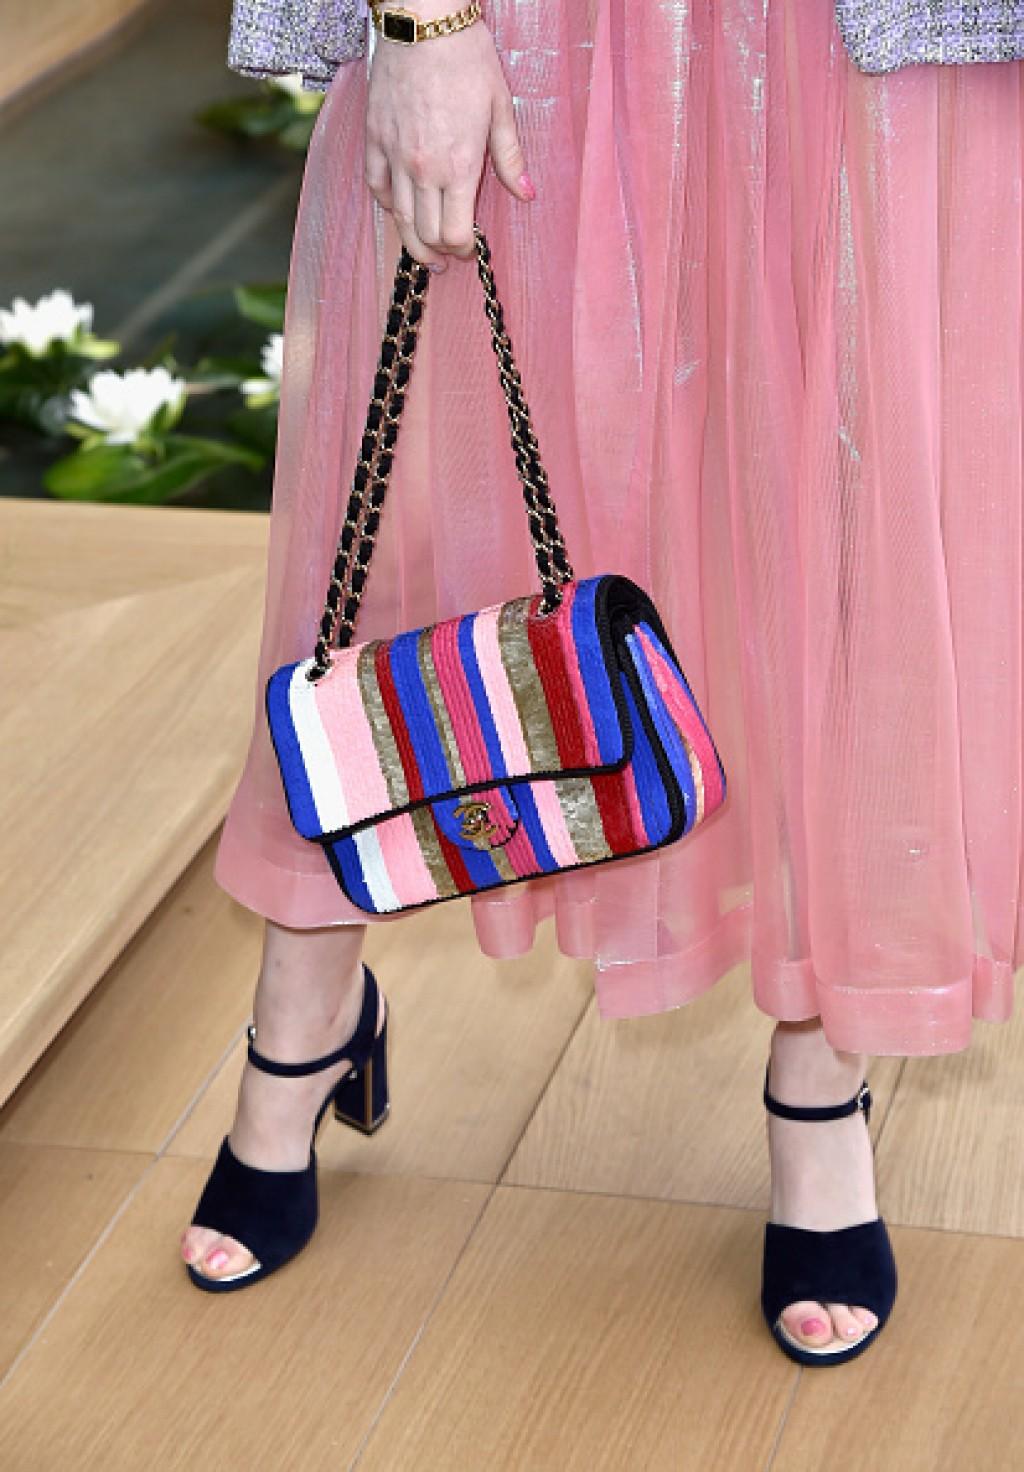 Chanel-Outside-Arrivals-Paris-Fashion-Week-Ellie-Bag-1024x1472